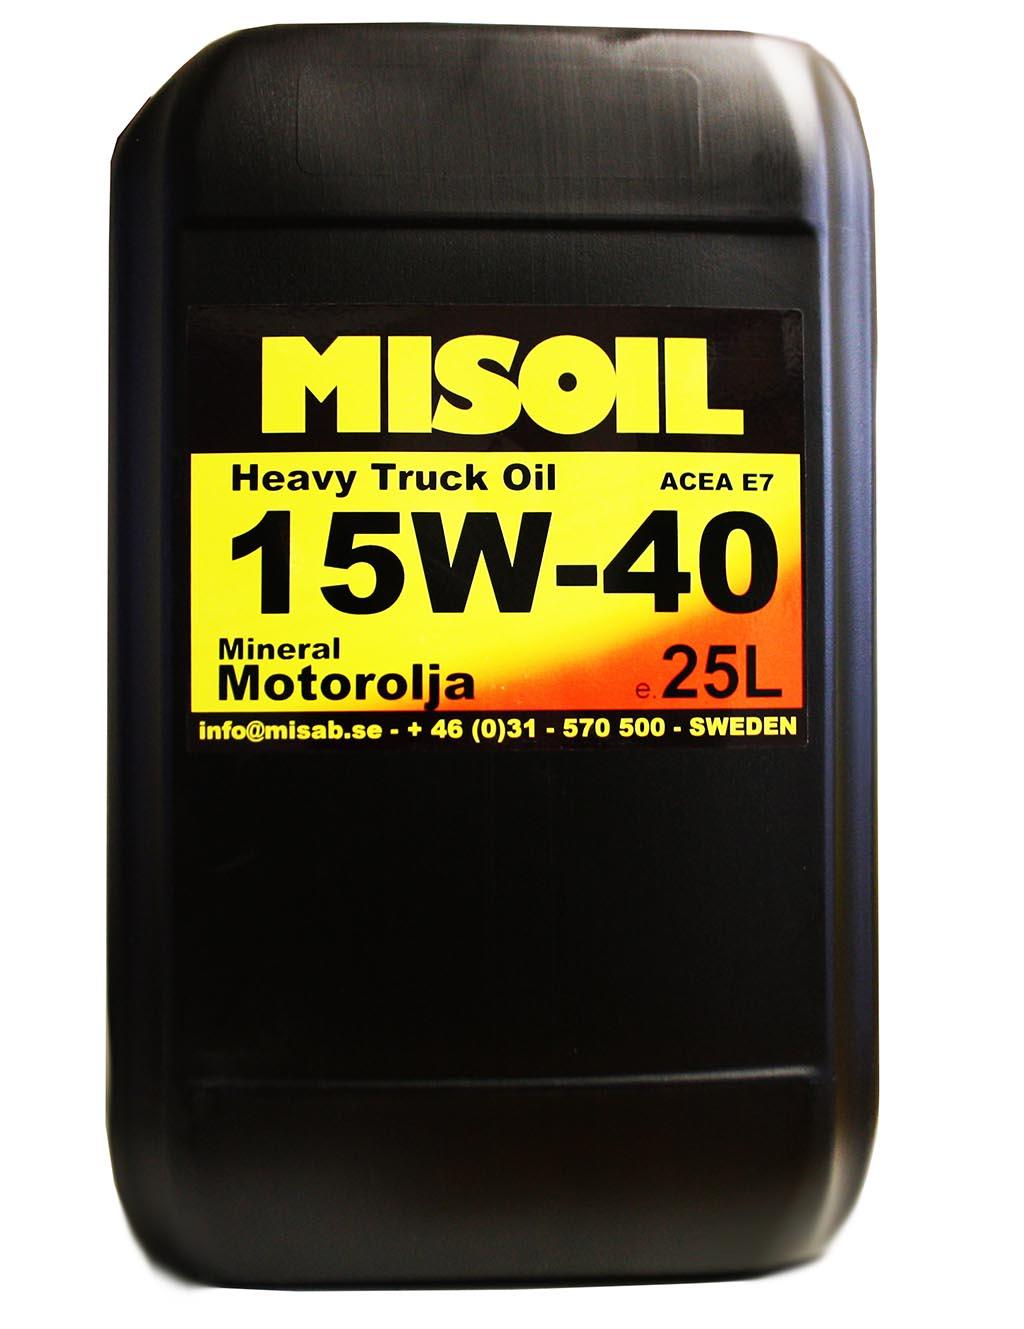 MISOIL HTO 15W-40 25L